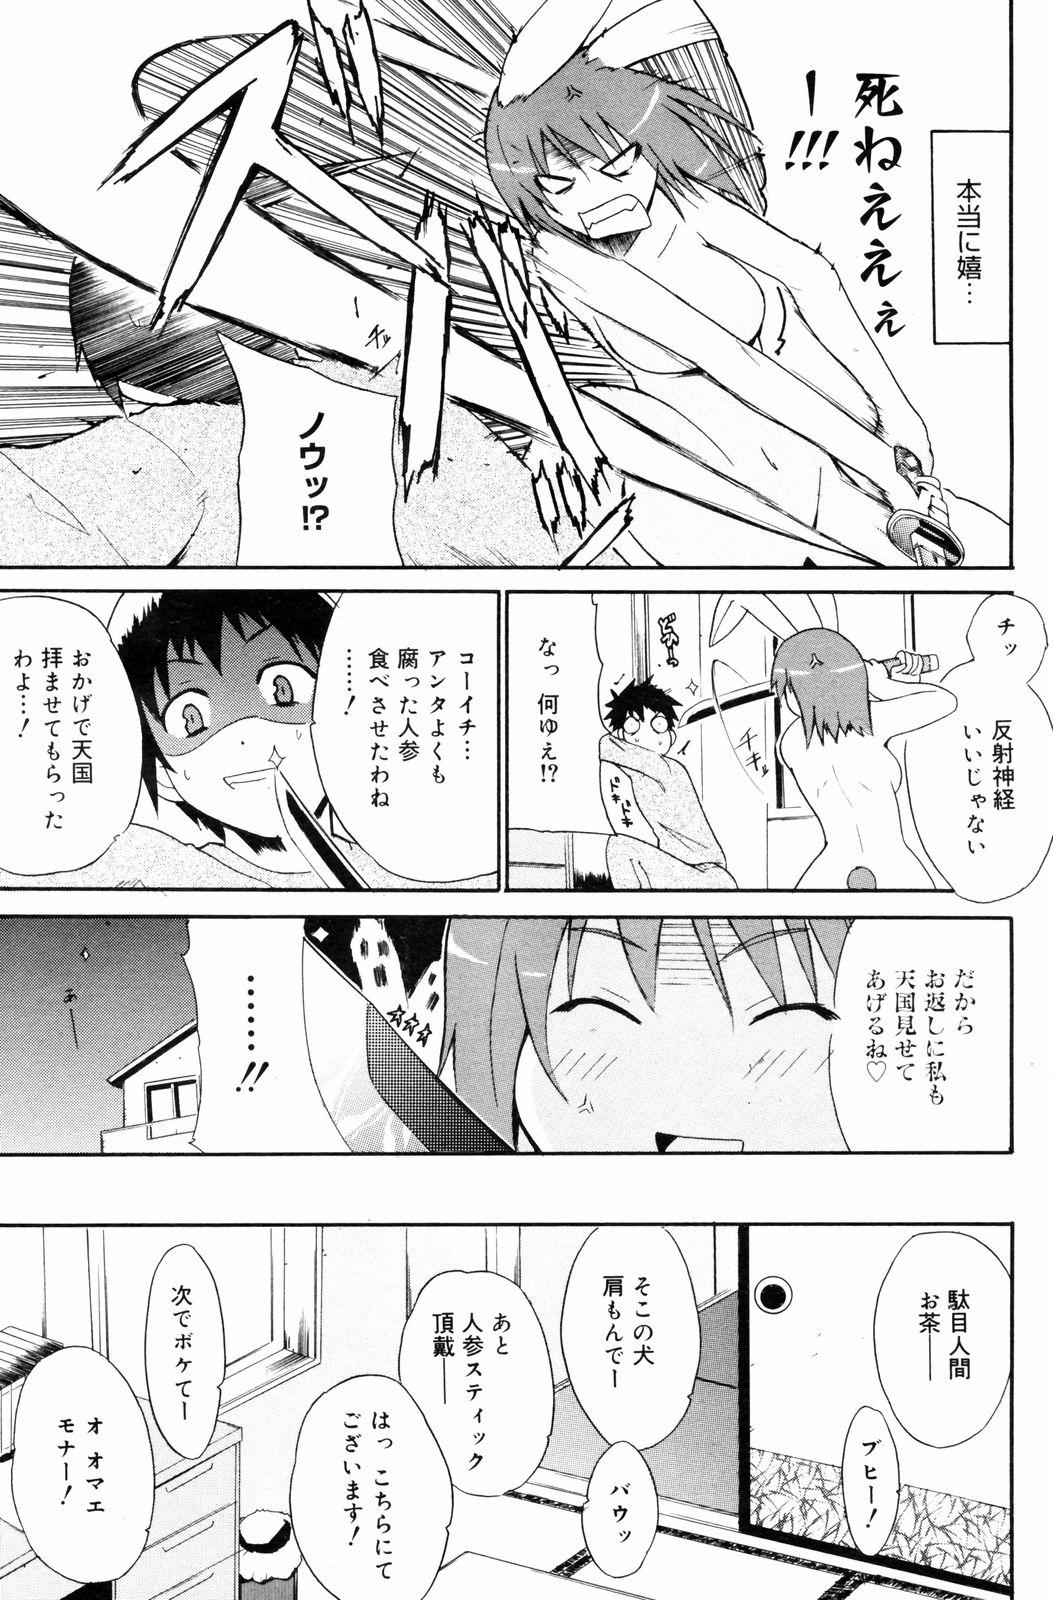 Manga Bangaichi 2008-03 118